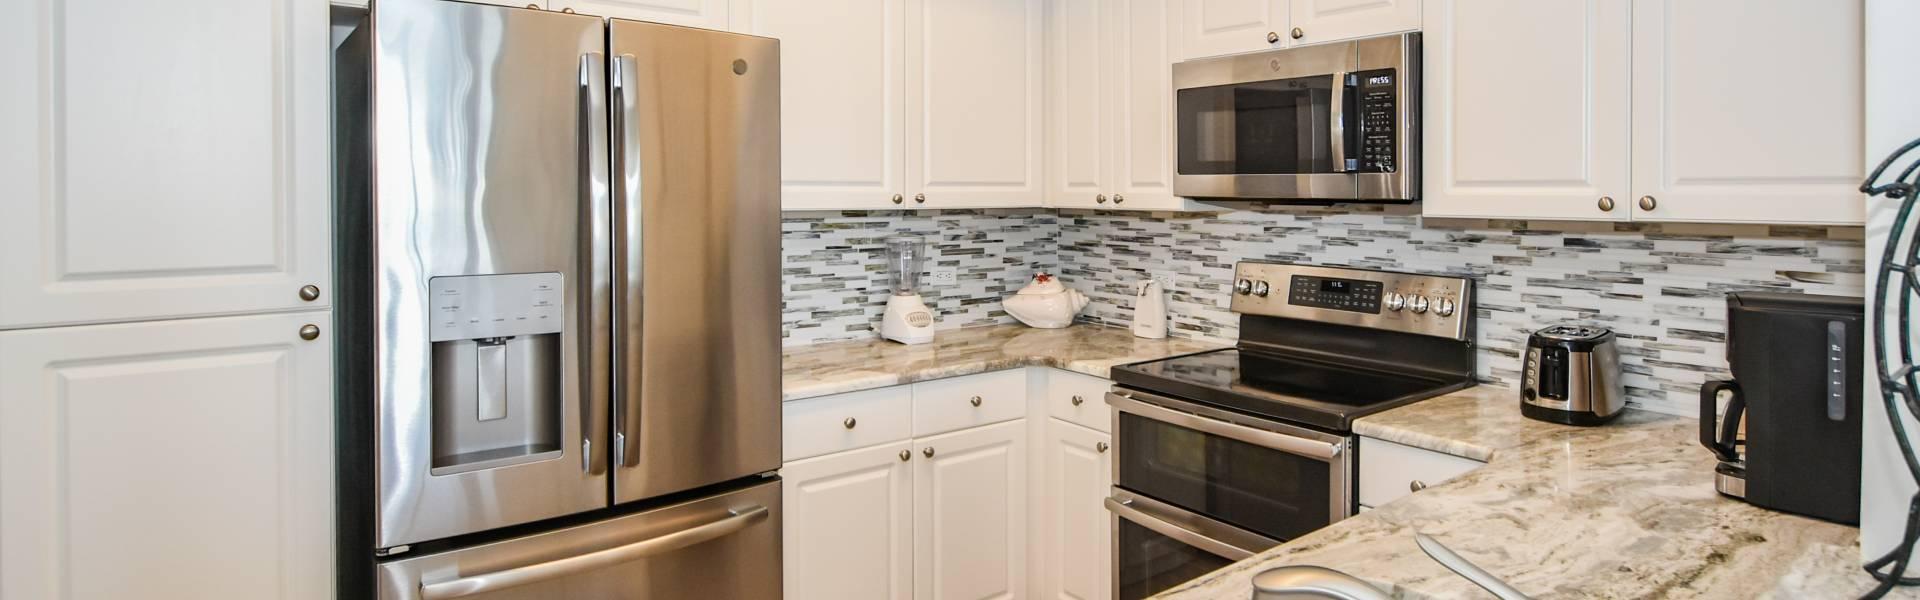 St. Croix 802 Kitchen Remodel